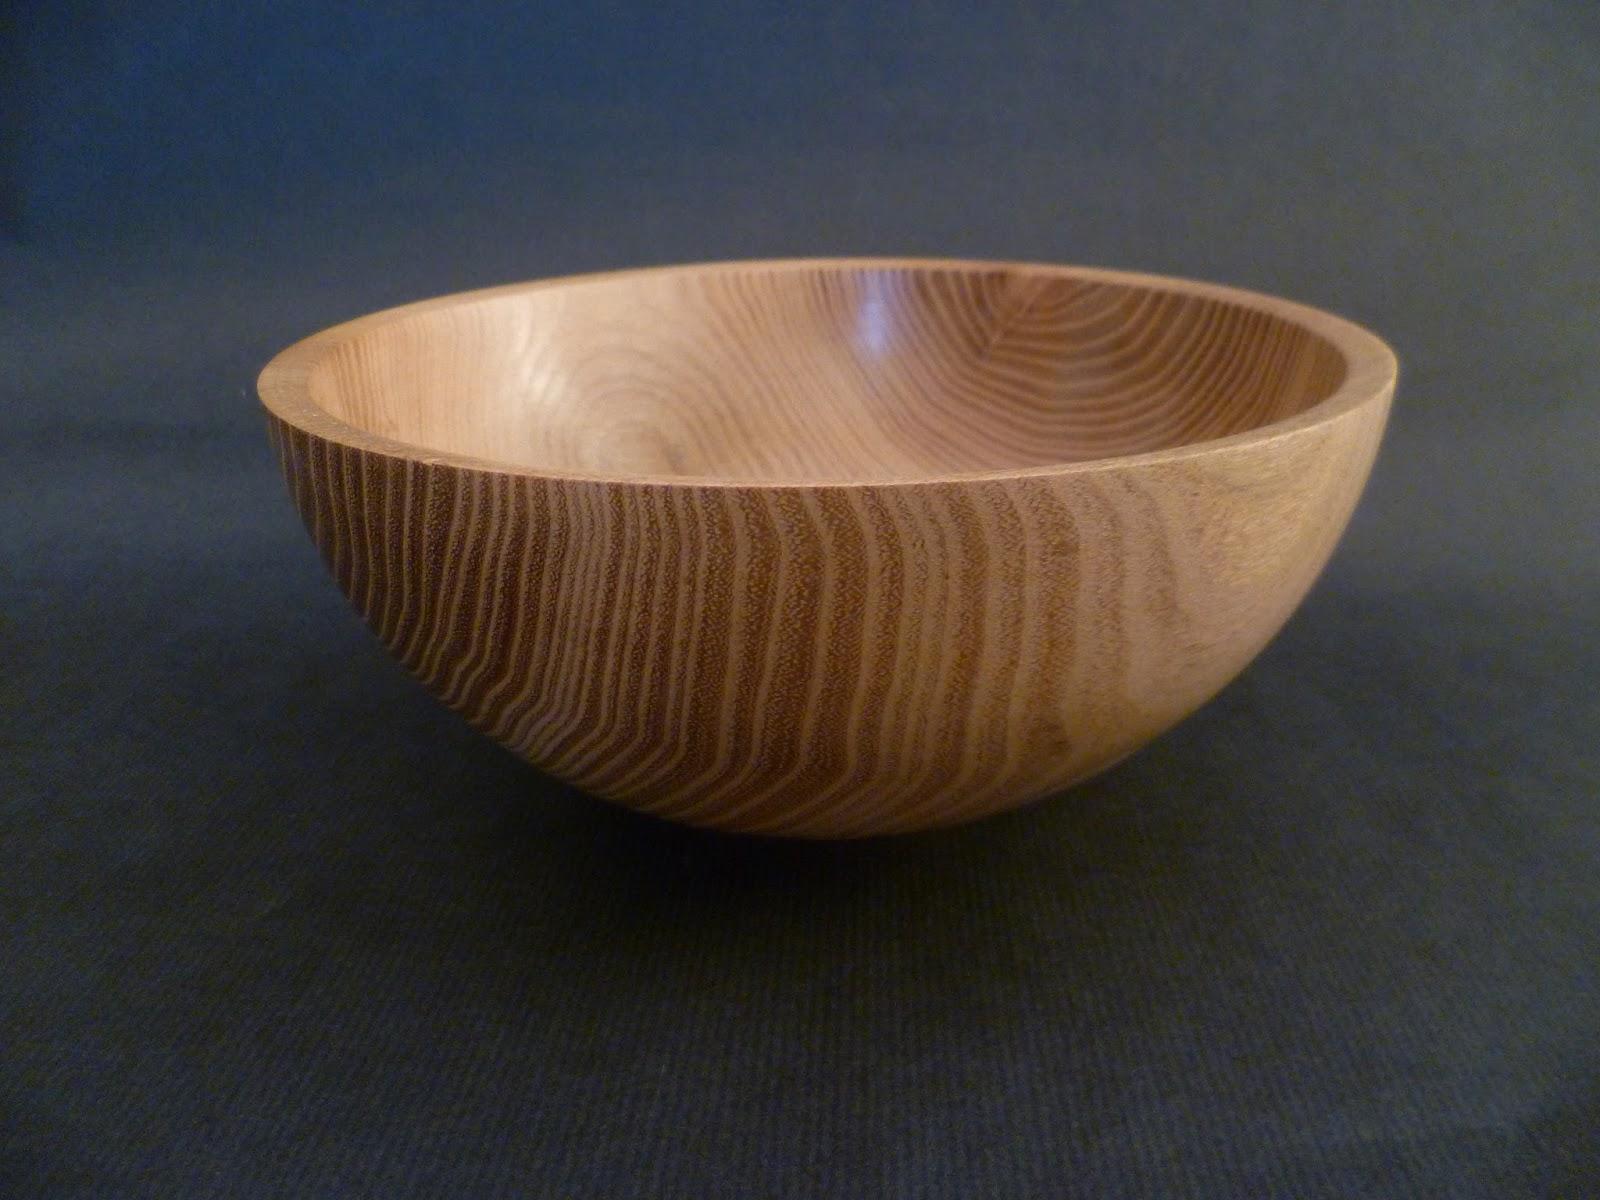 atelier du bois tourn woodturning design 2 bols en bois de robinier faux acacia. Black Bedroom Furniture Sets. Home Design Ideas